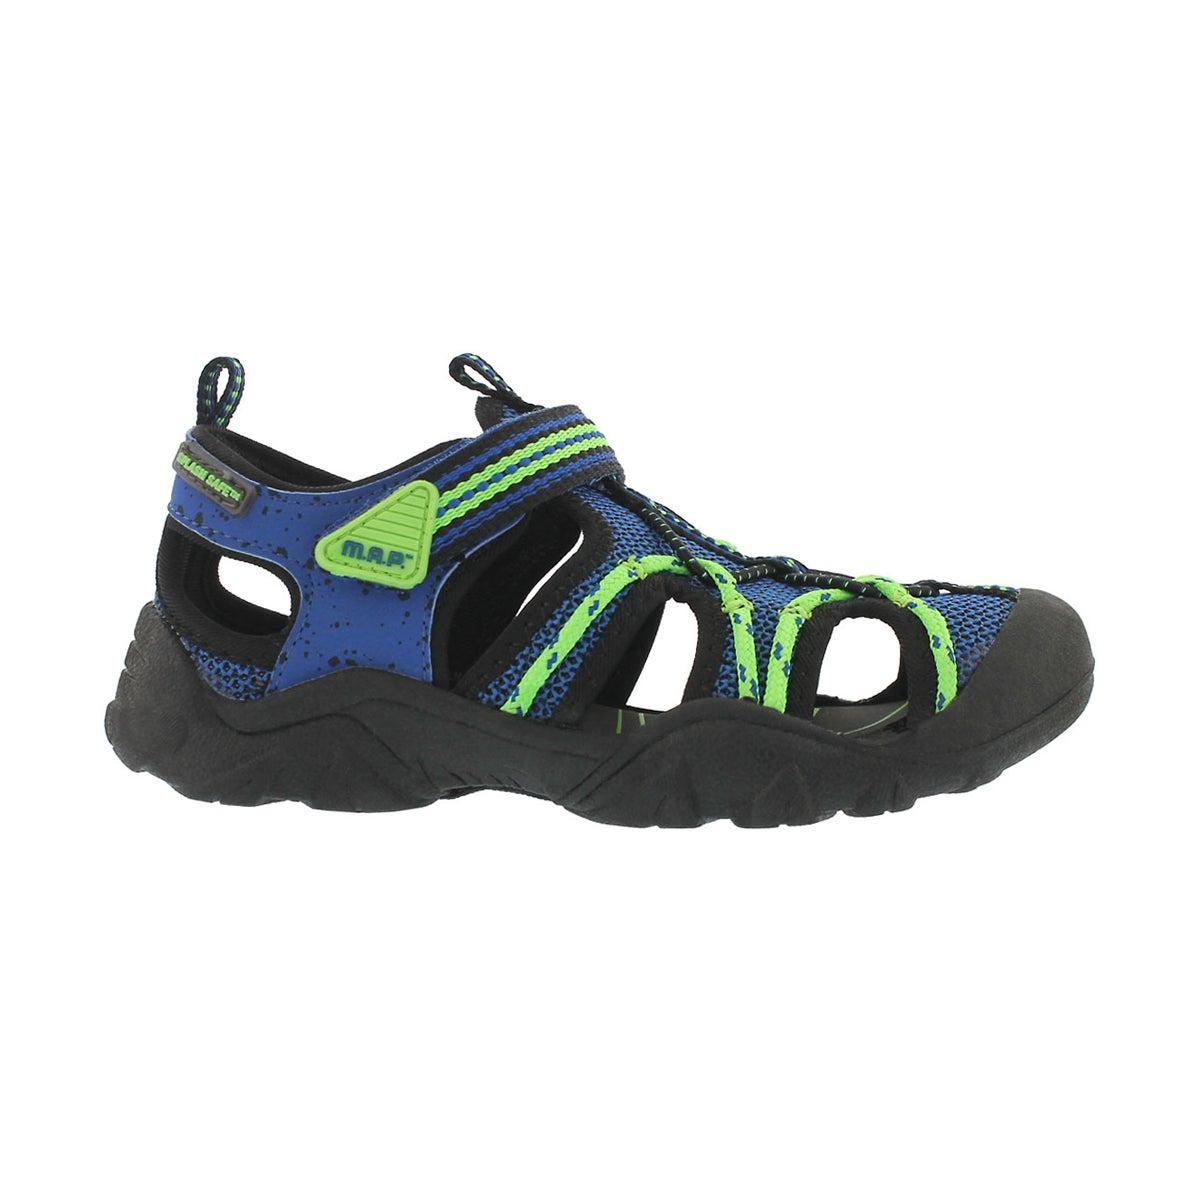 Bys Emmons blk/blu fisherman sandal